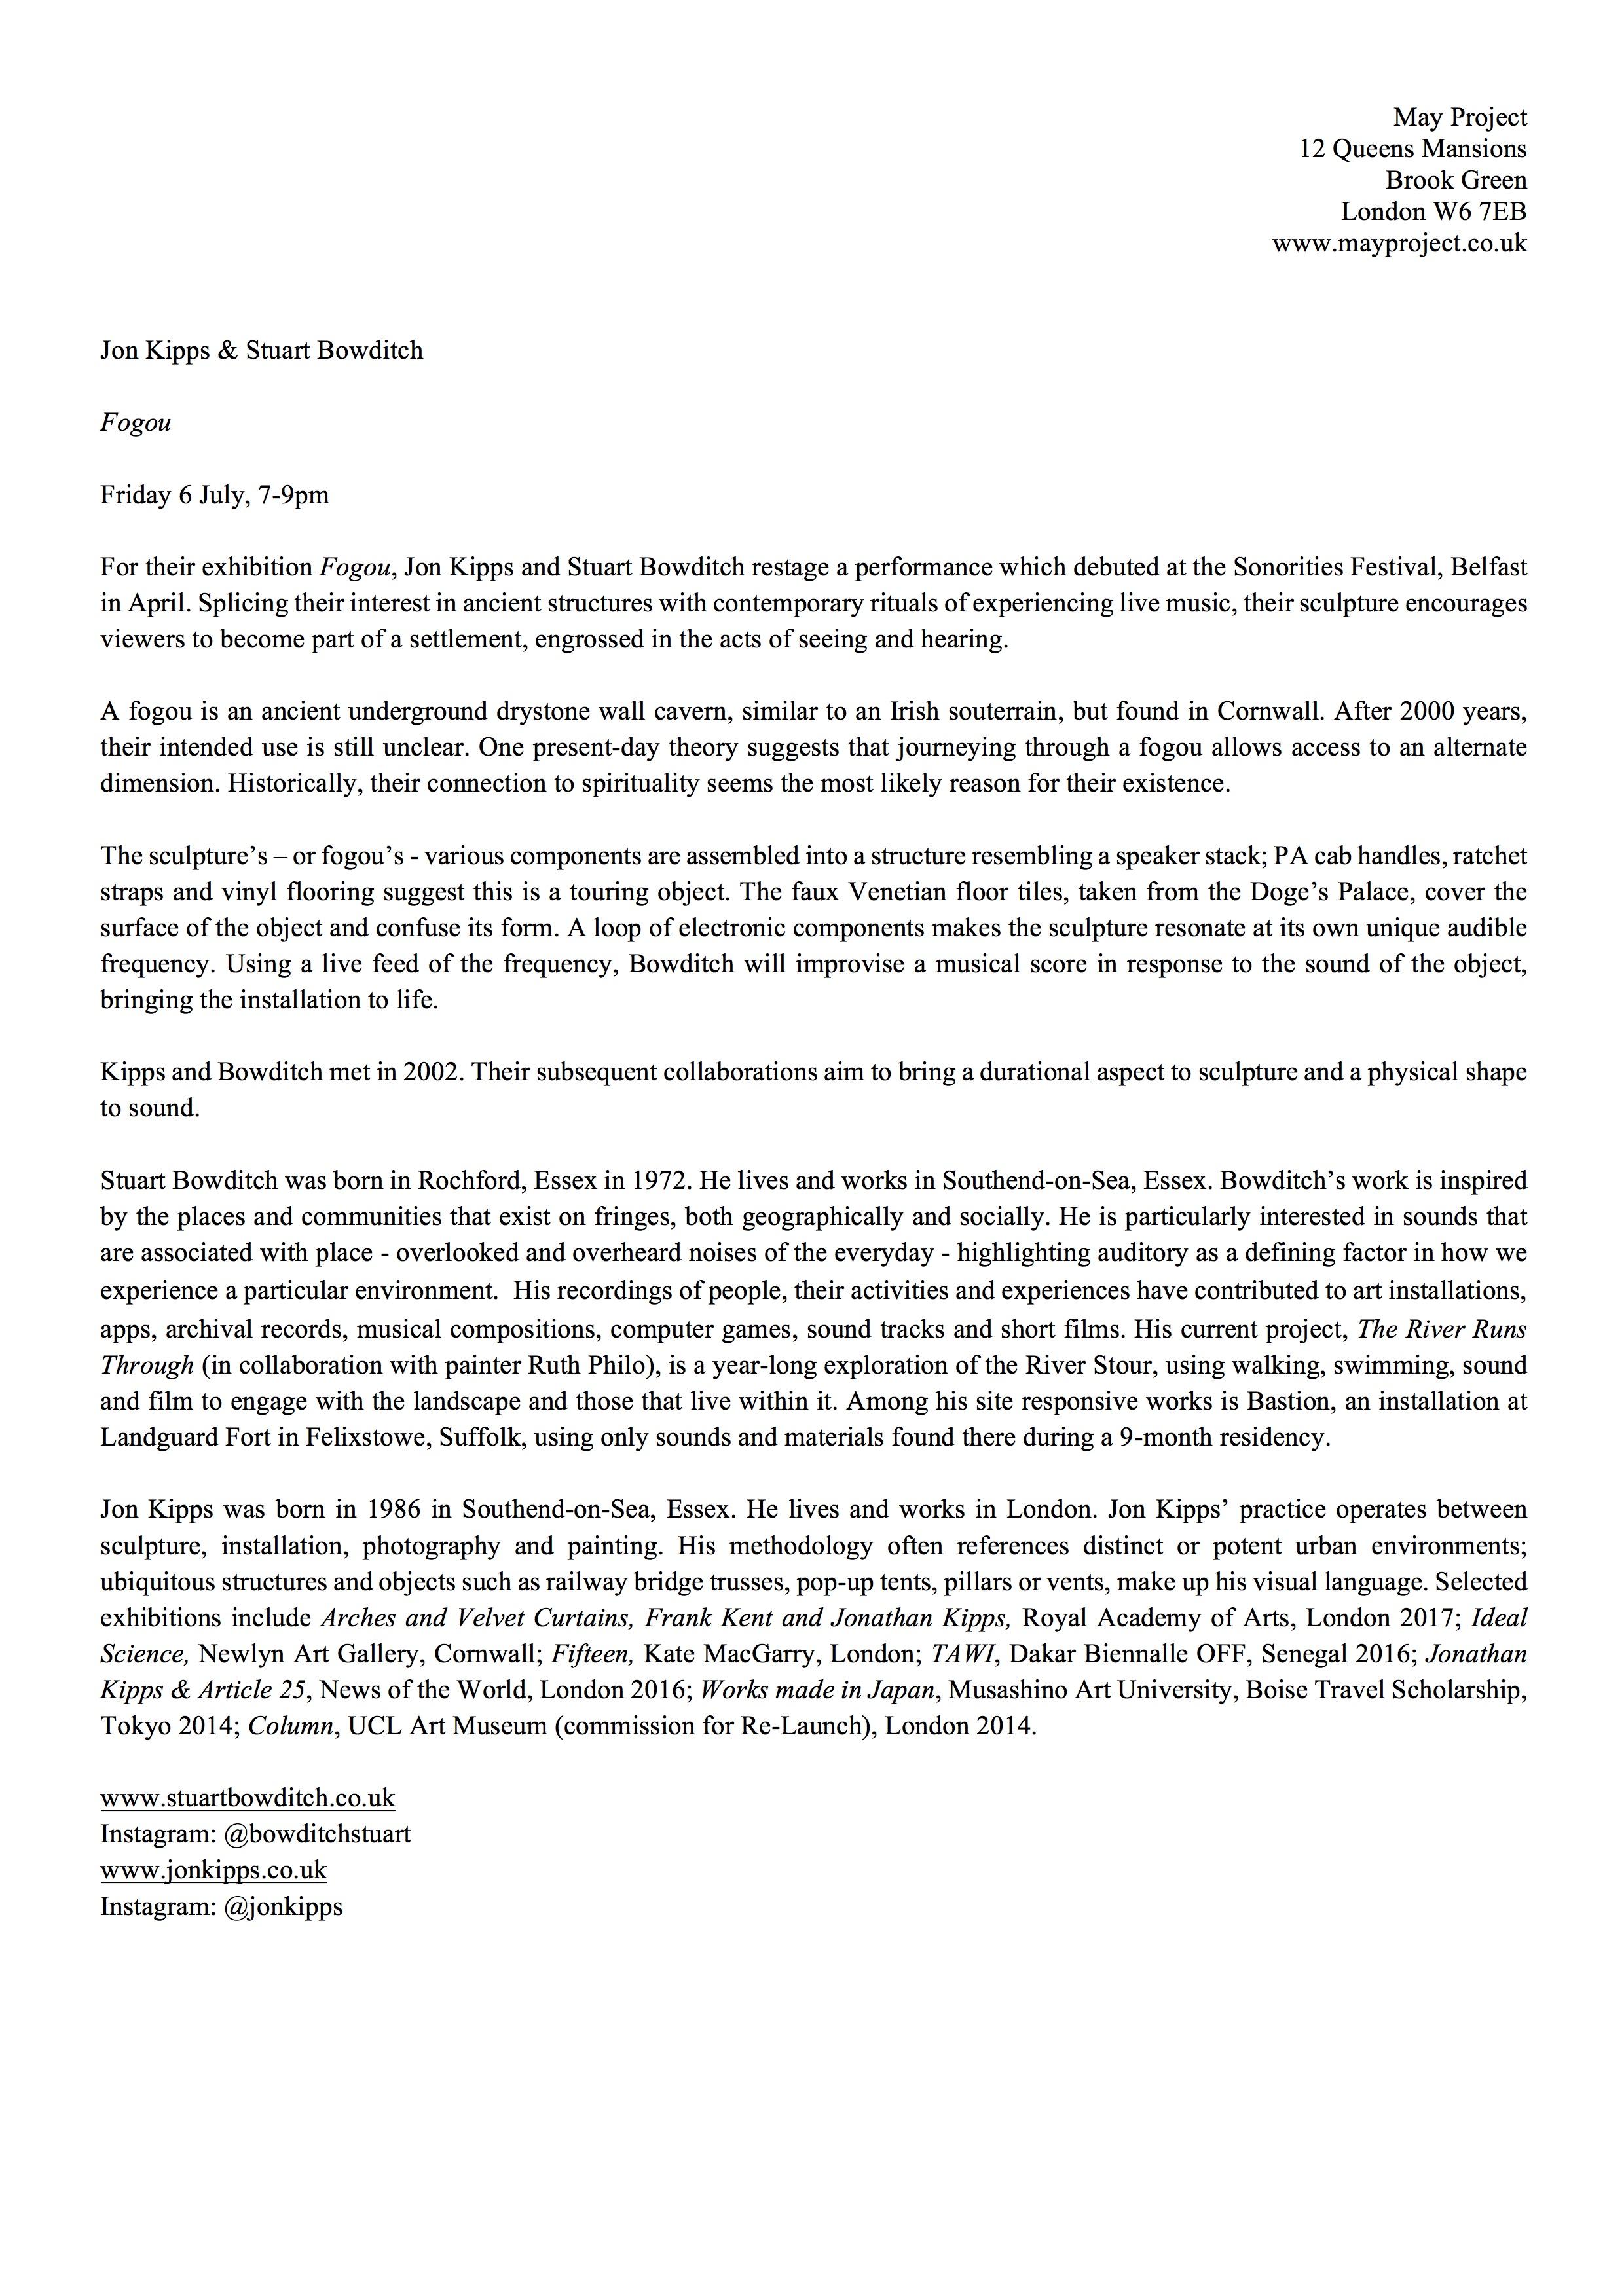 Press release jpg.jpg